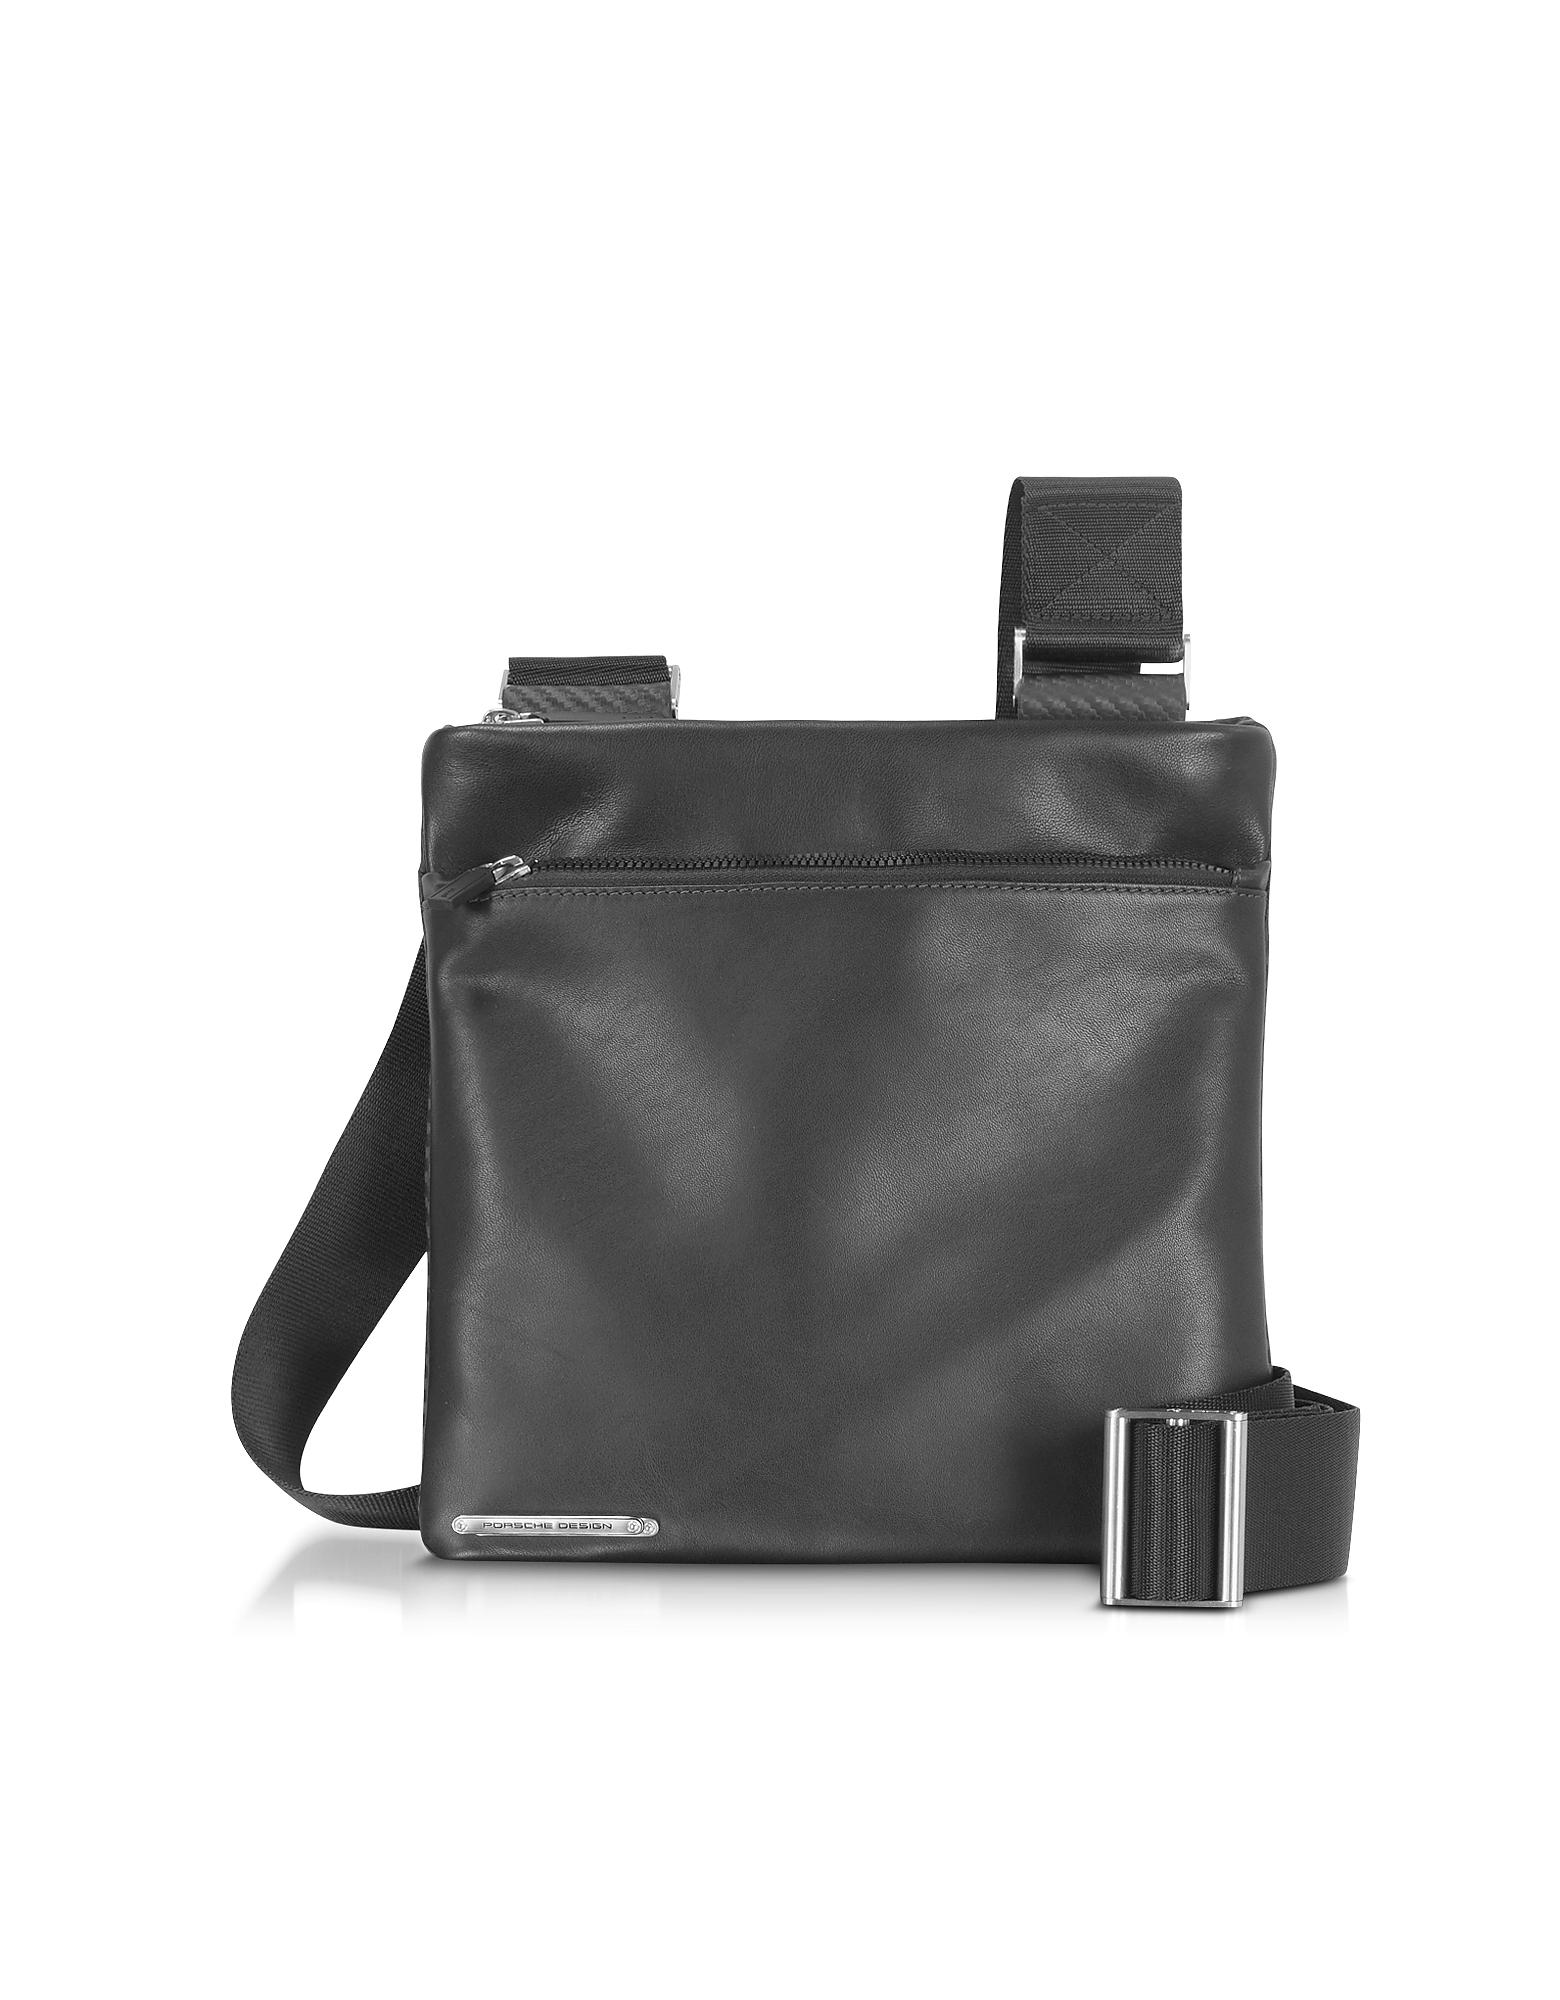 Porsche Design Designer Travel Bags,  CL 2.0 - Black Crossbody Bag